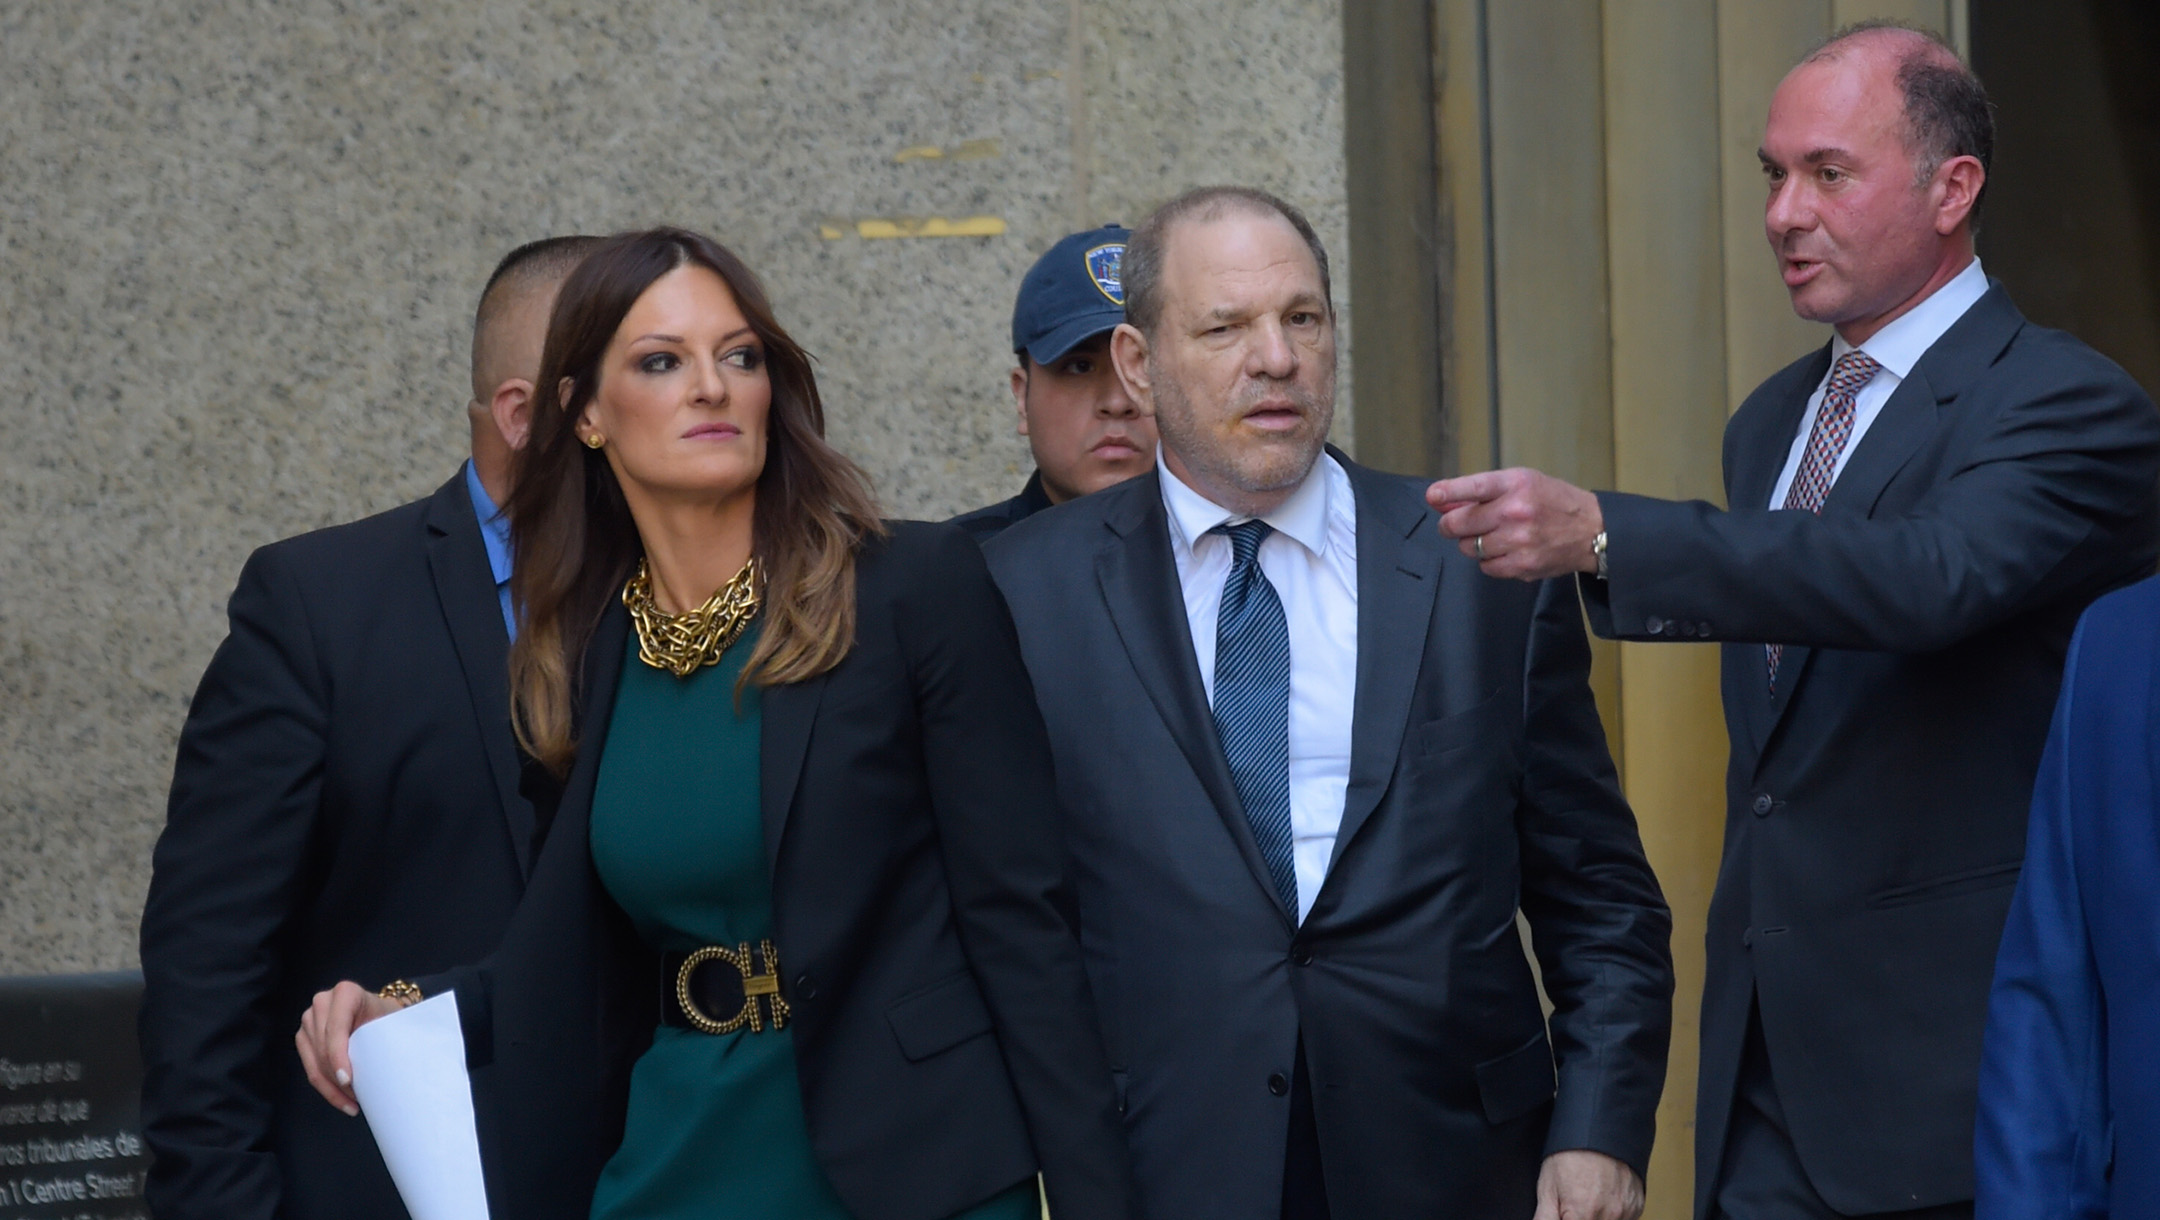 Harvey Weinstein accusers agree to $19 million settlement